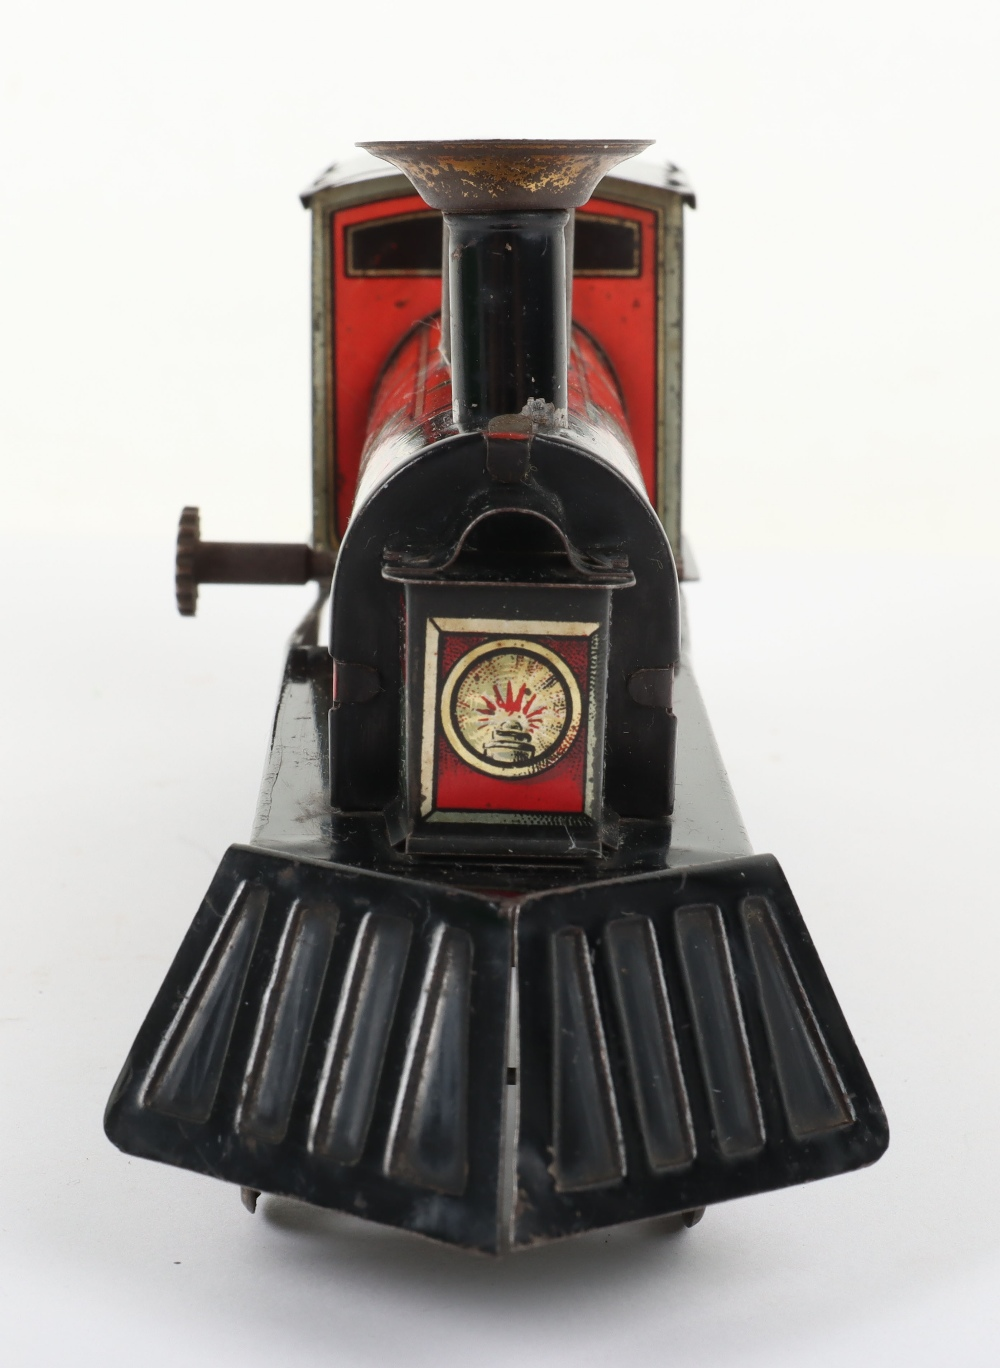 Hess 1023 tinplate friction driven U.S style floor train, German circa 1905 - Image 5 of 5